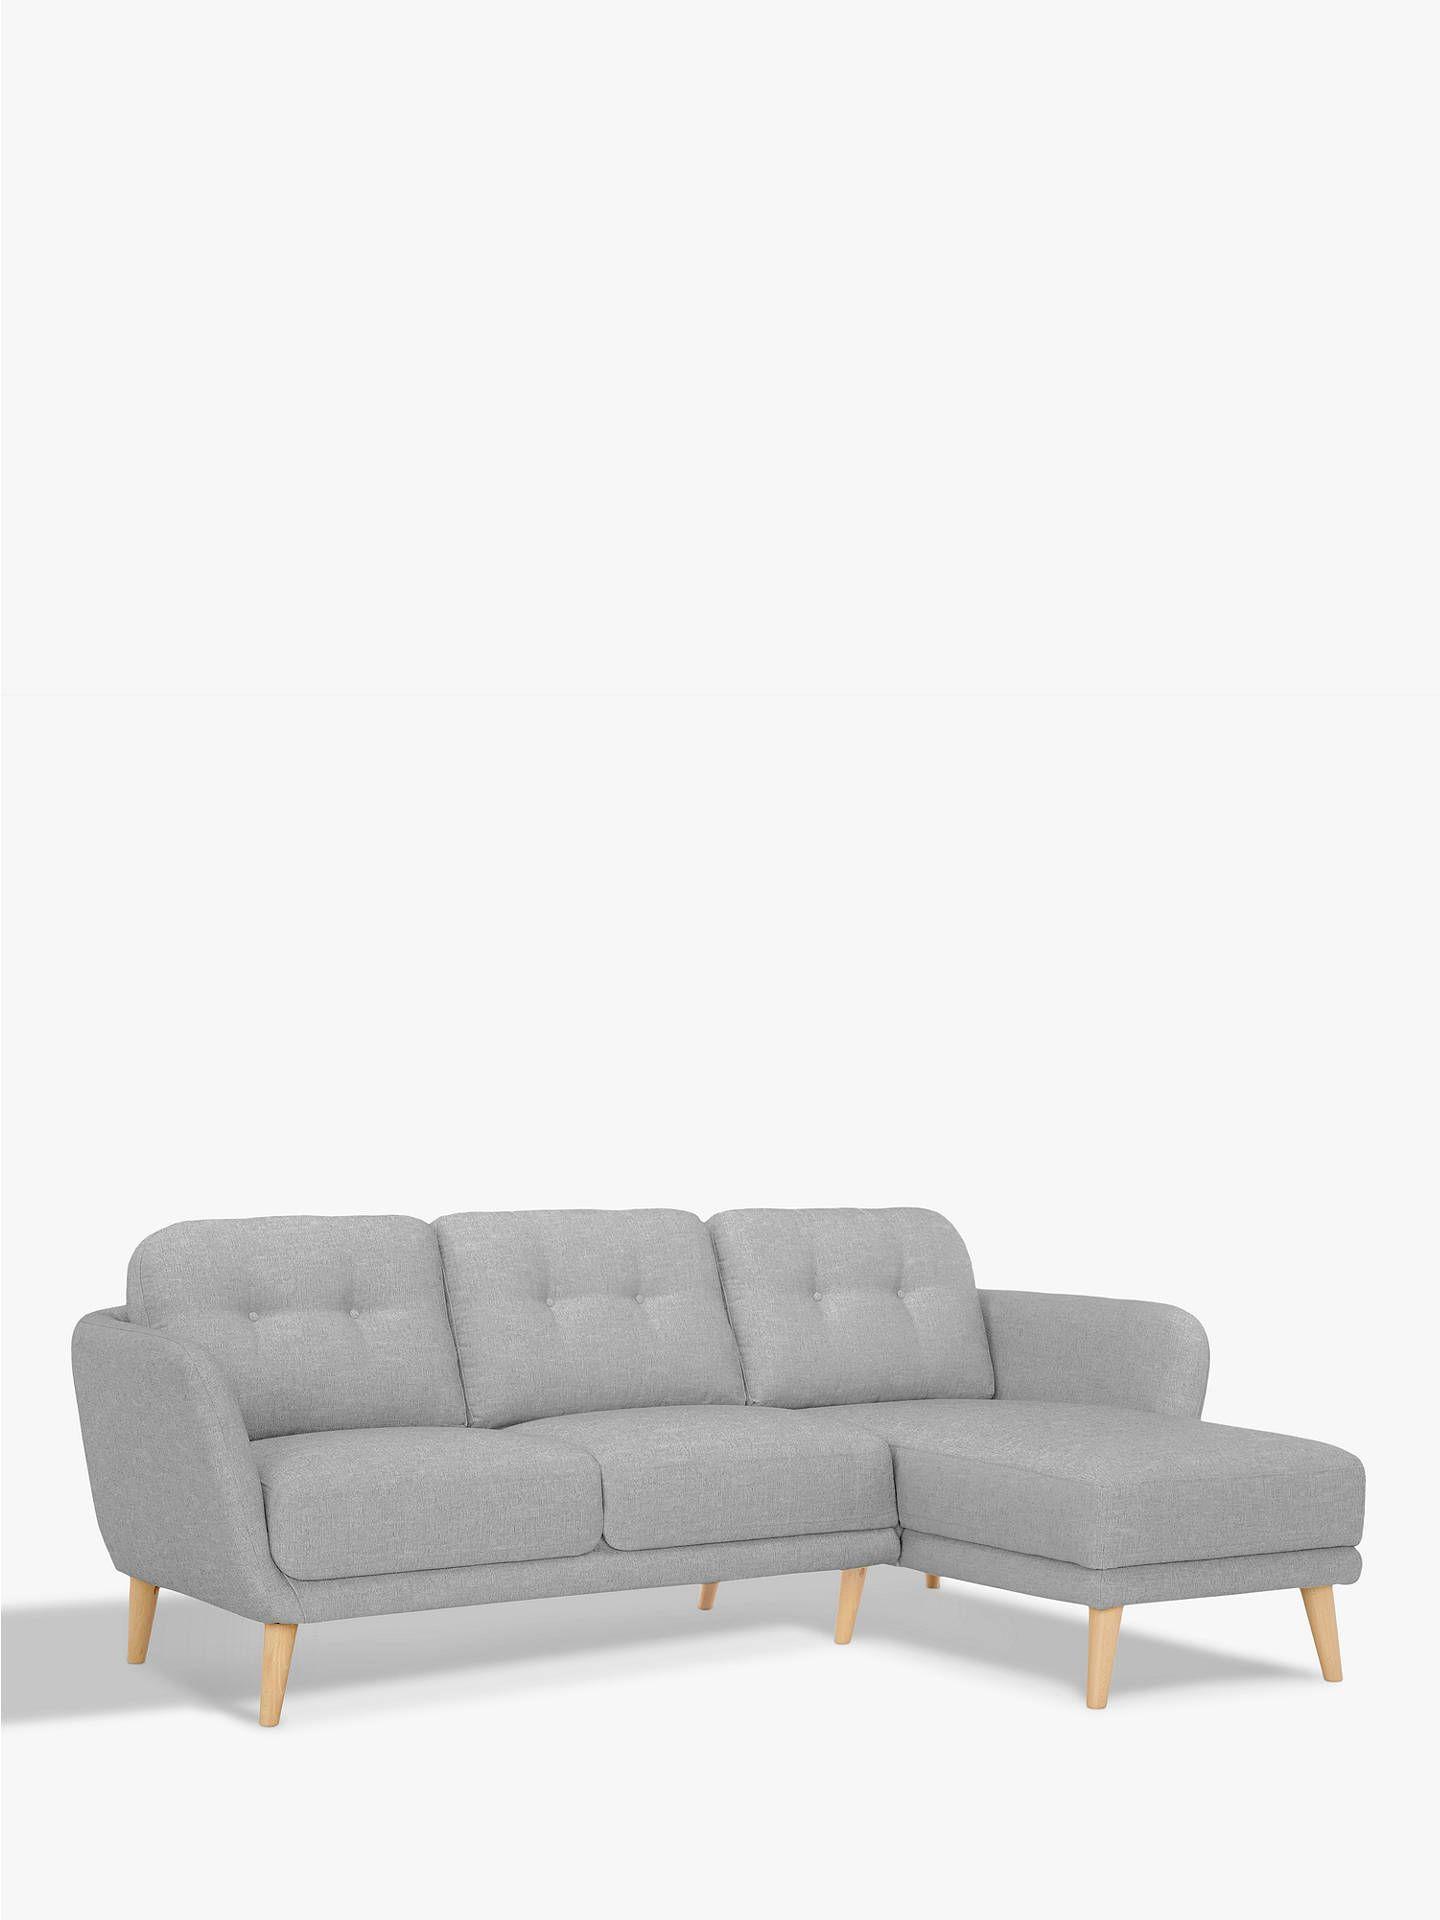 House by John Lewis Arlo RHF Chaise End Sofa | Sitting room | Sofa ...